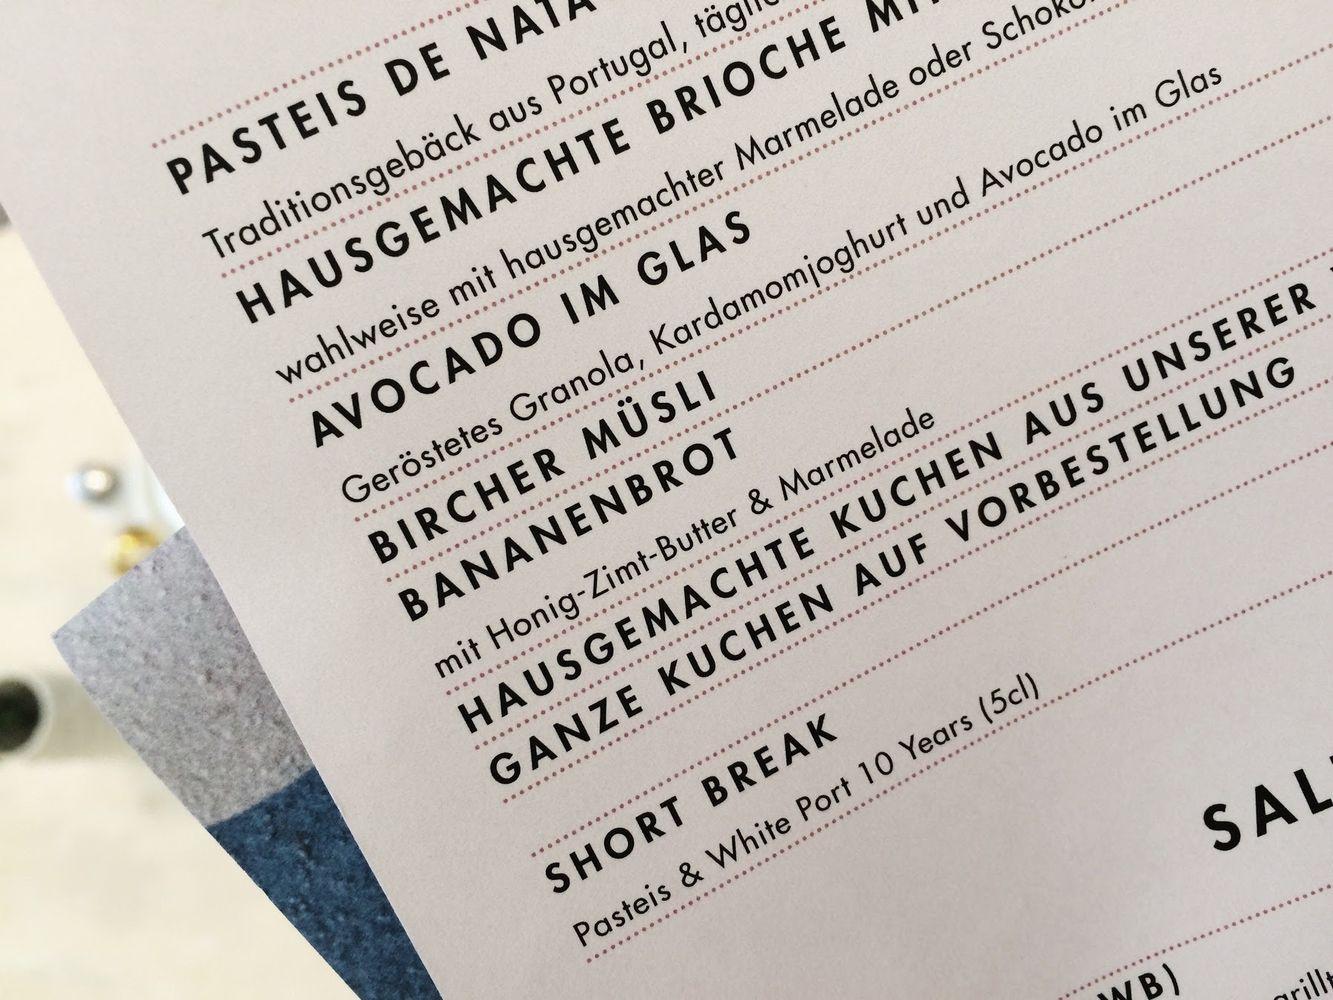 Stereo Cafe Munich Menu